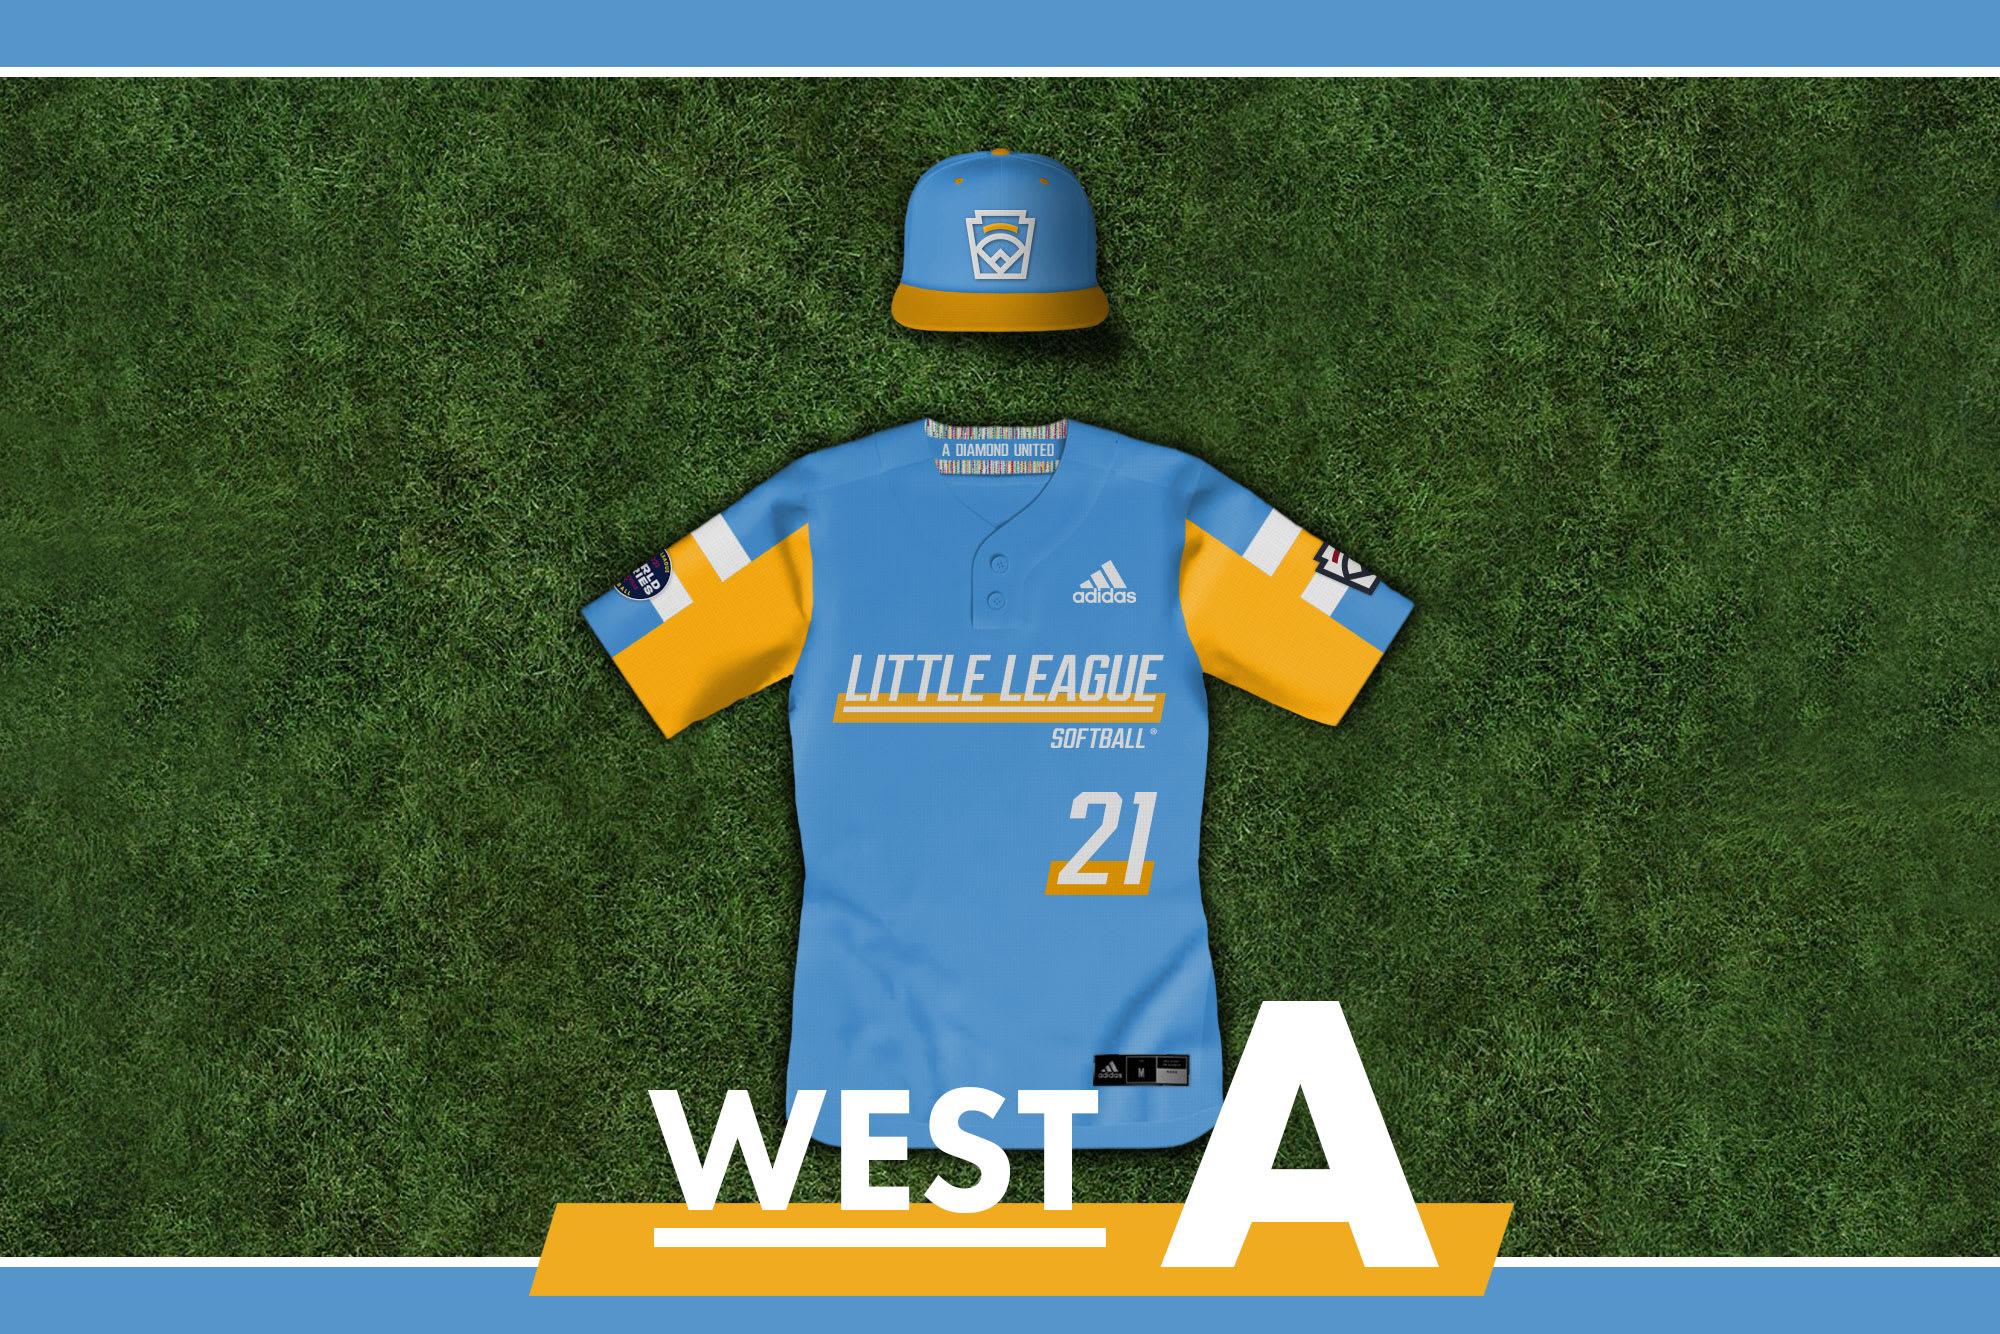 LLSB West A uniform